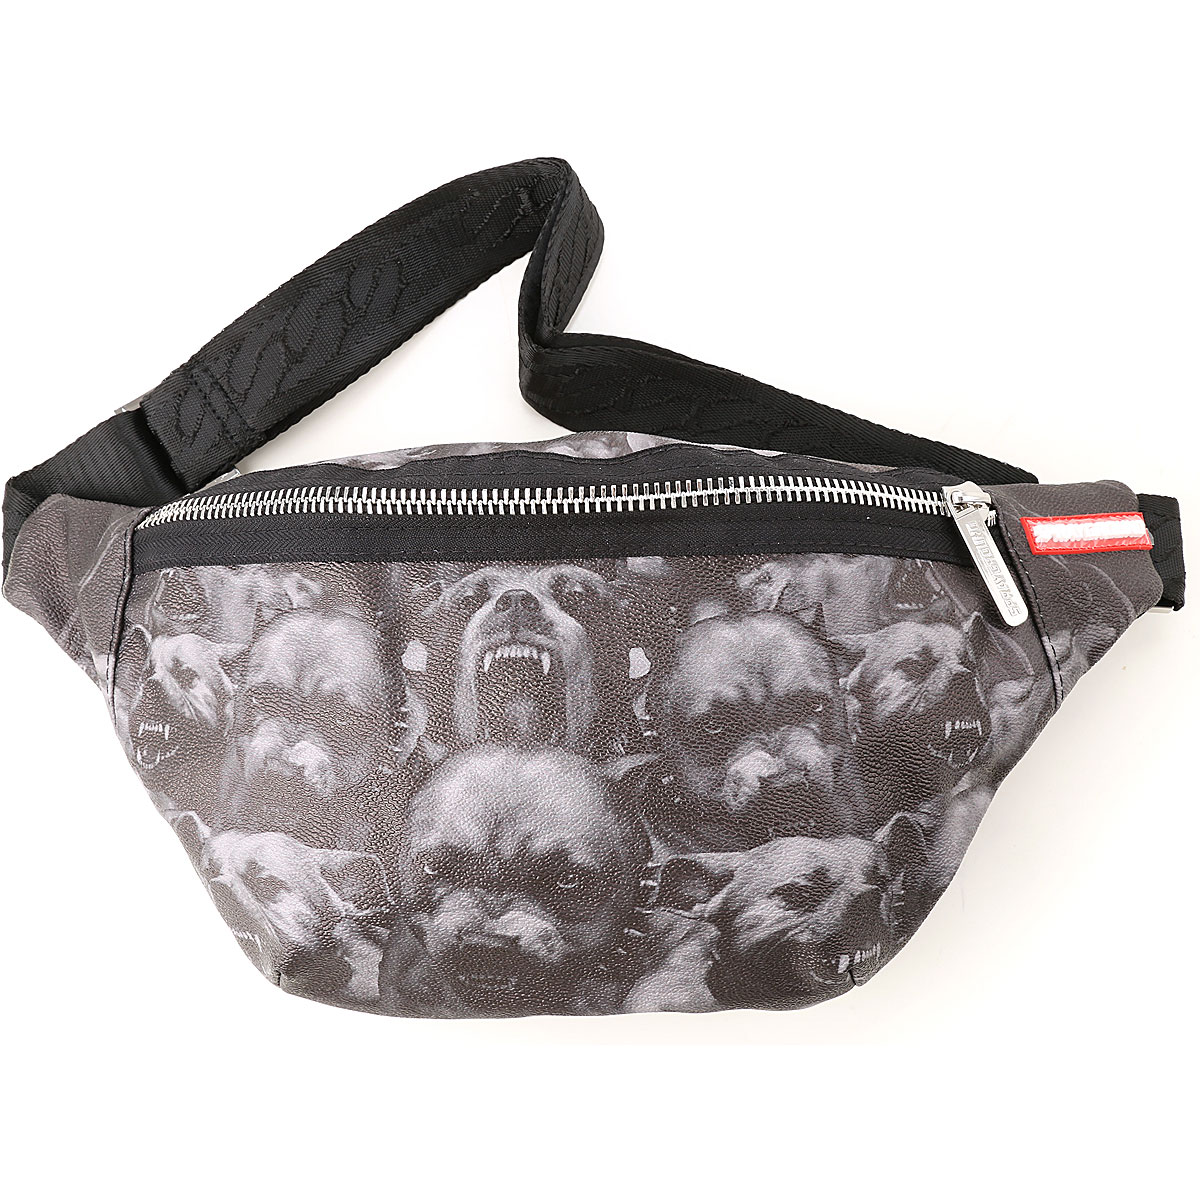 Sprayground Shoulder Bags On Sale, Black, polyestere, 2019